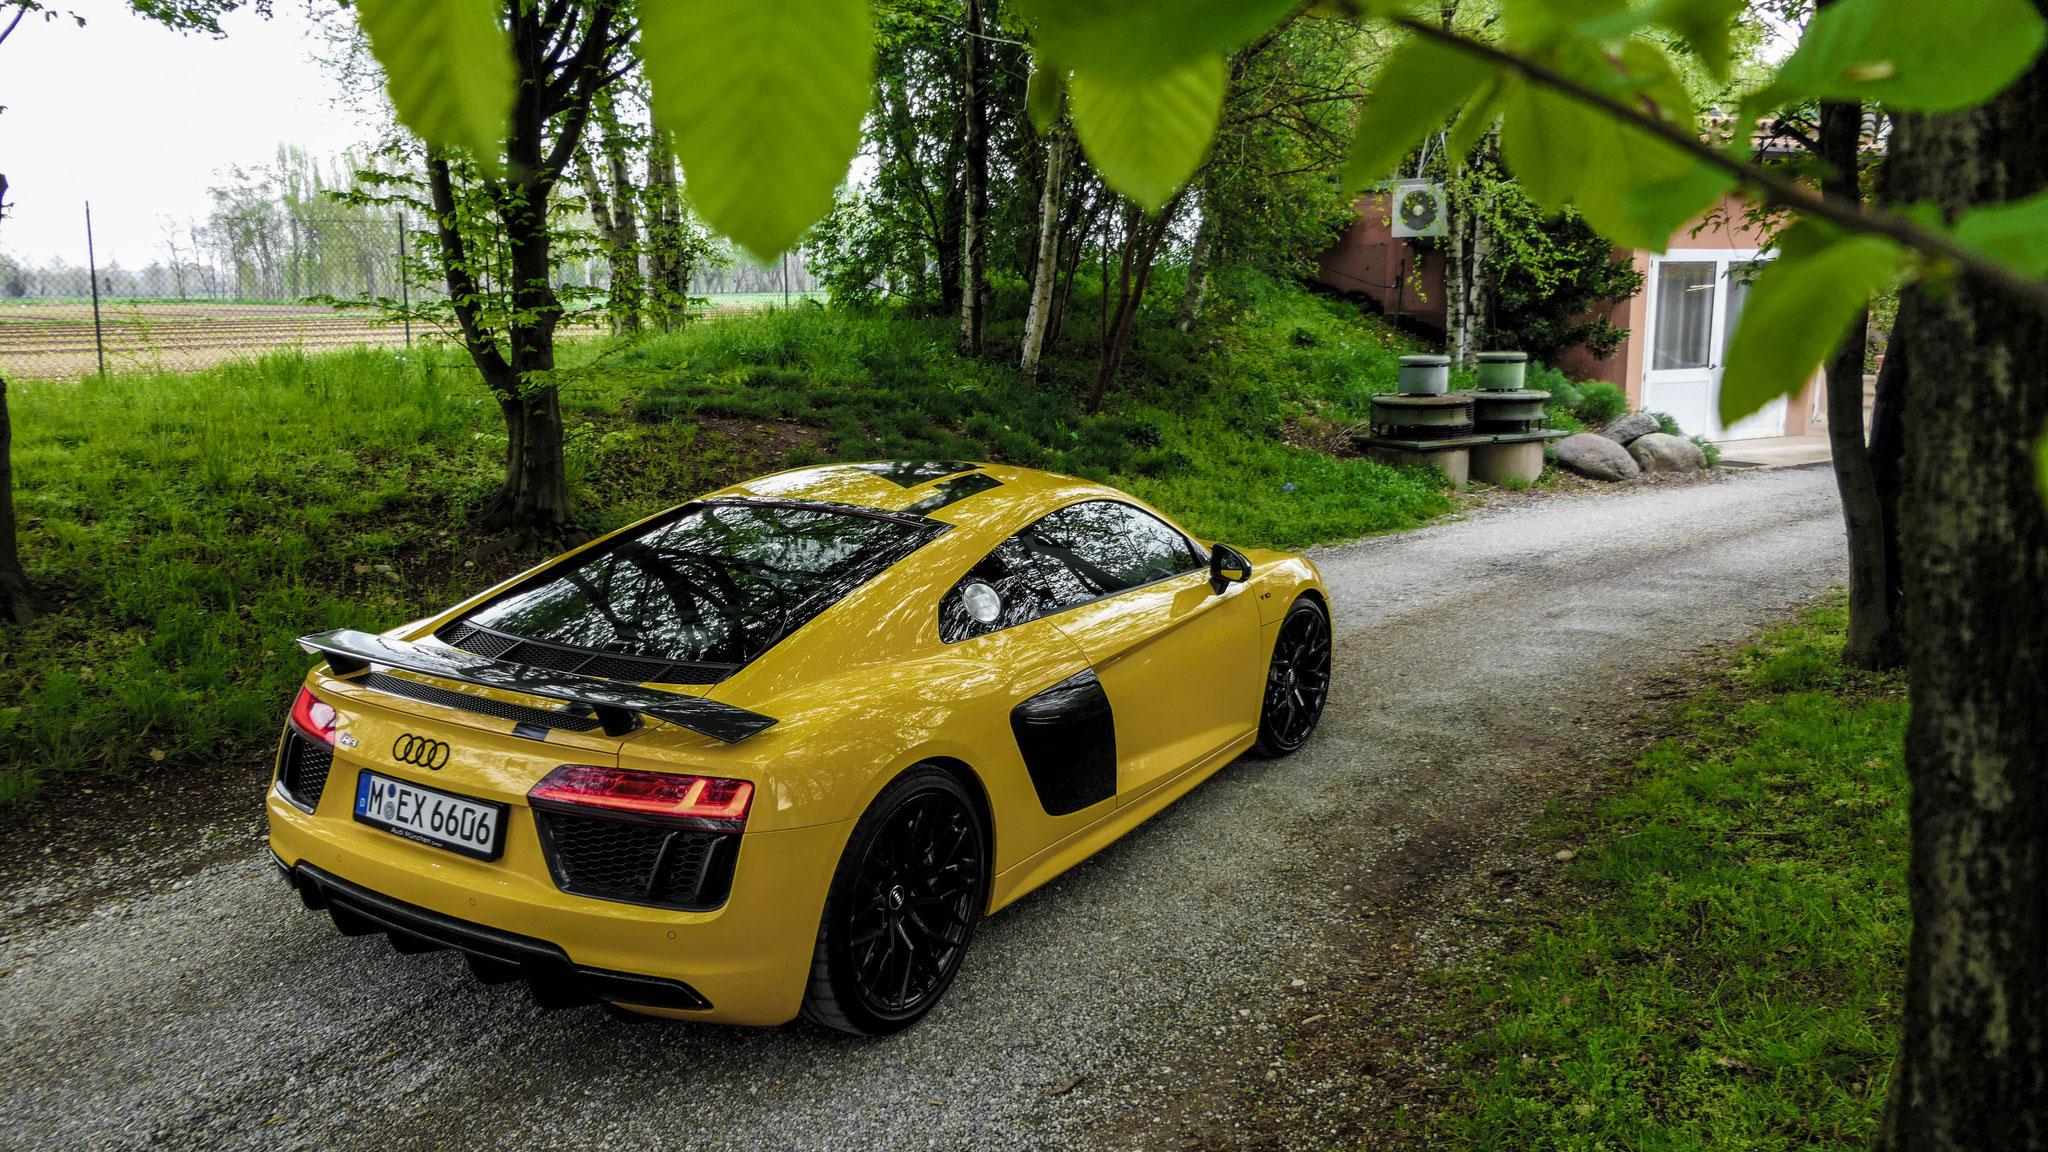 Audi R8 V10 RWD - M-EX-6606